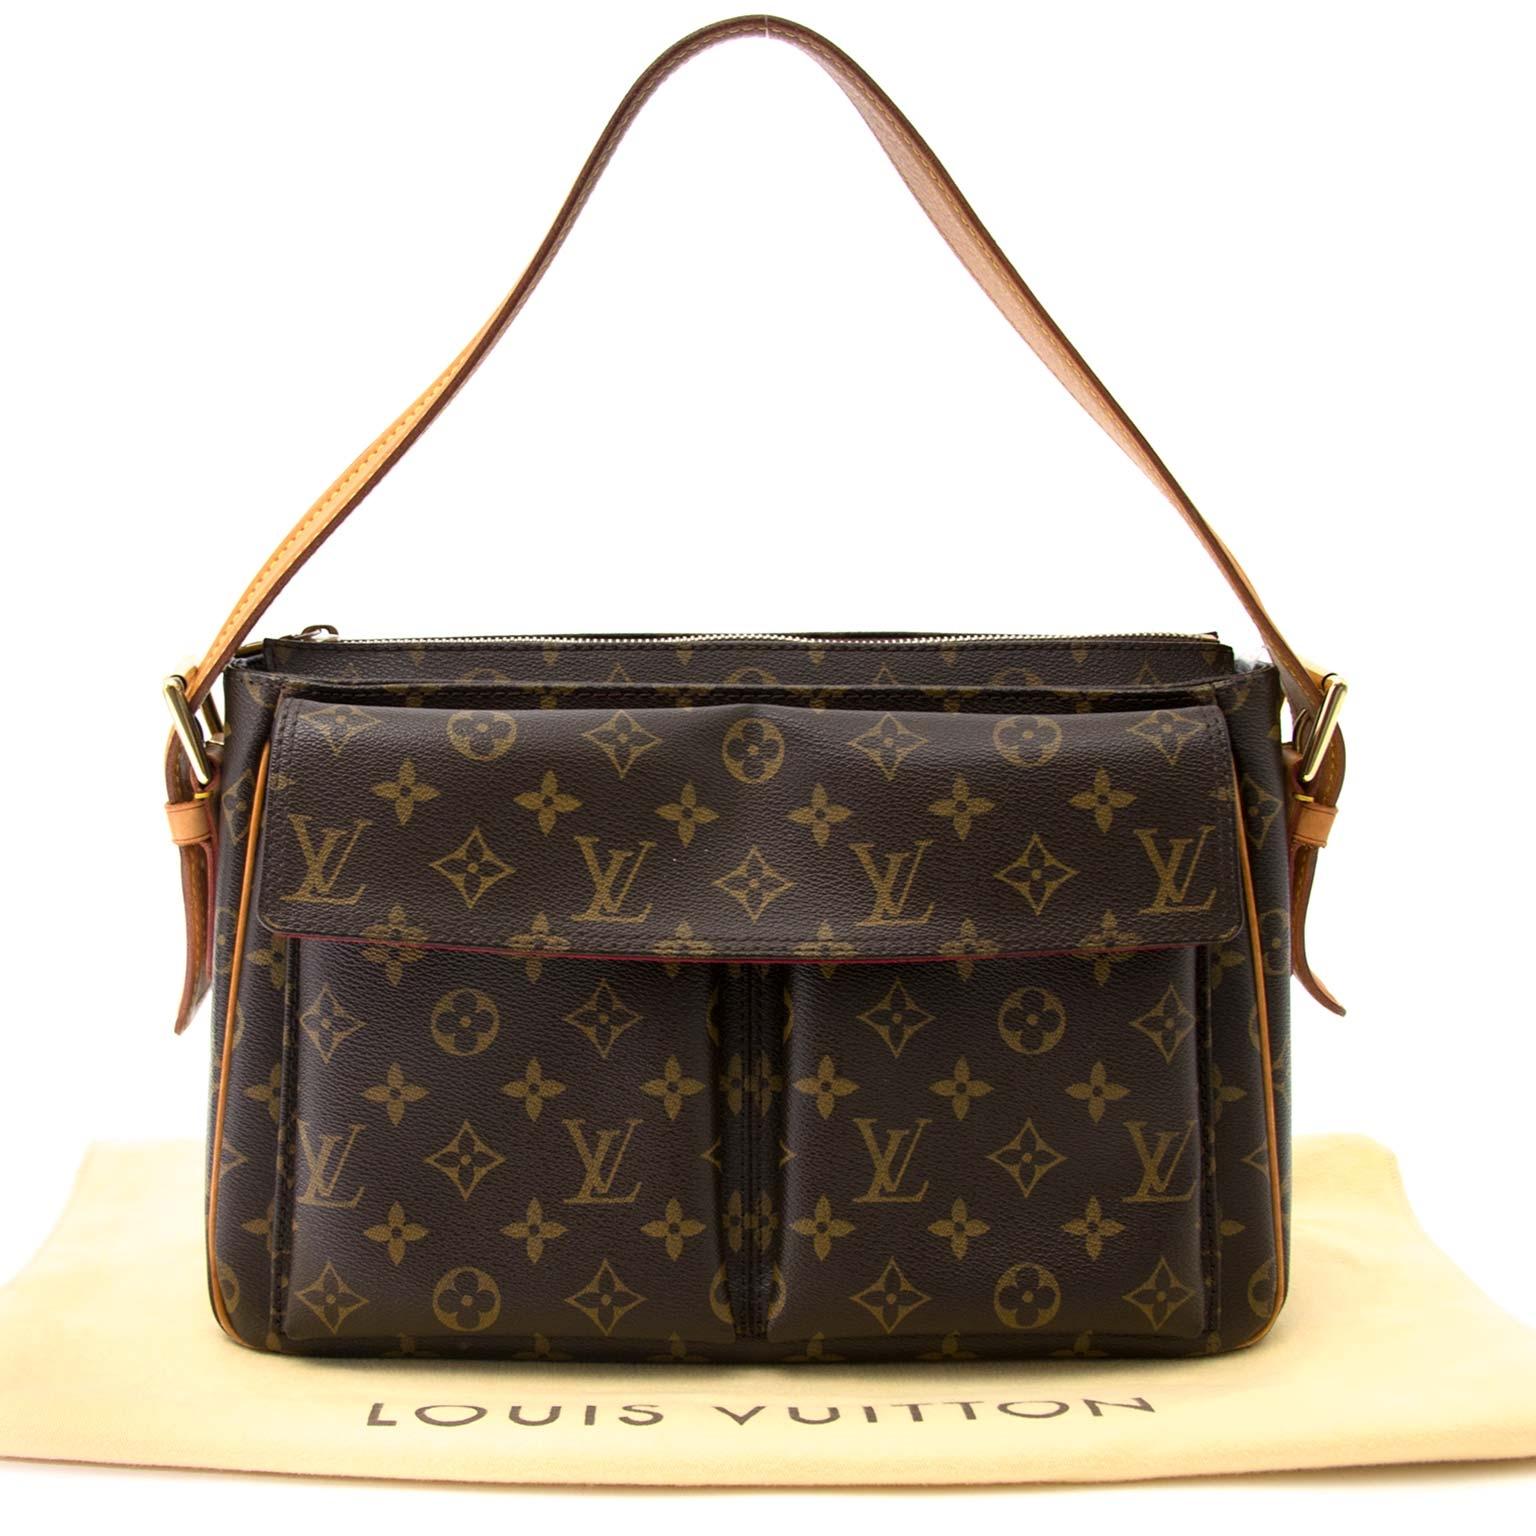 Louis Vuitton Monogram Viva Cite GM Shoulder Bag